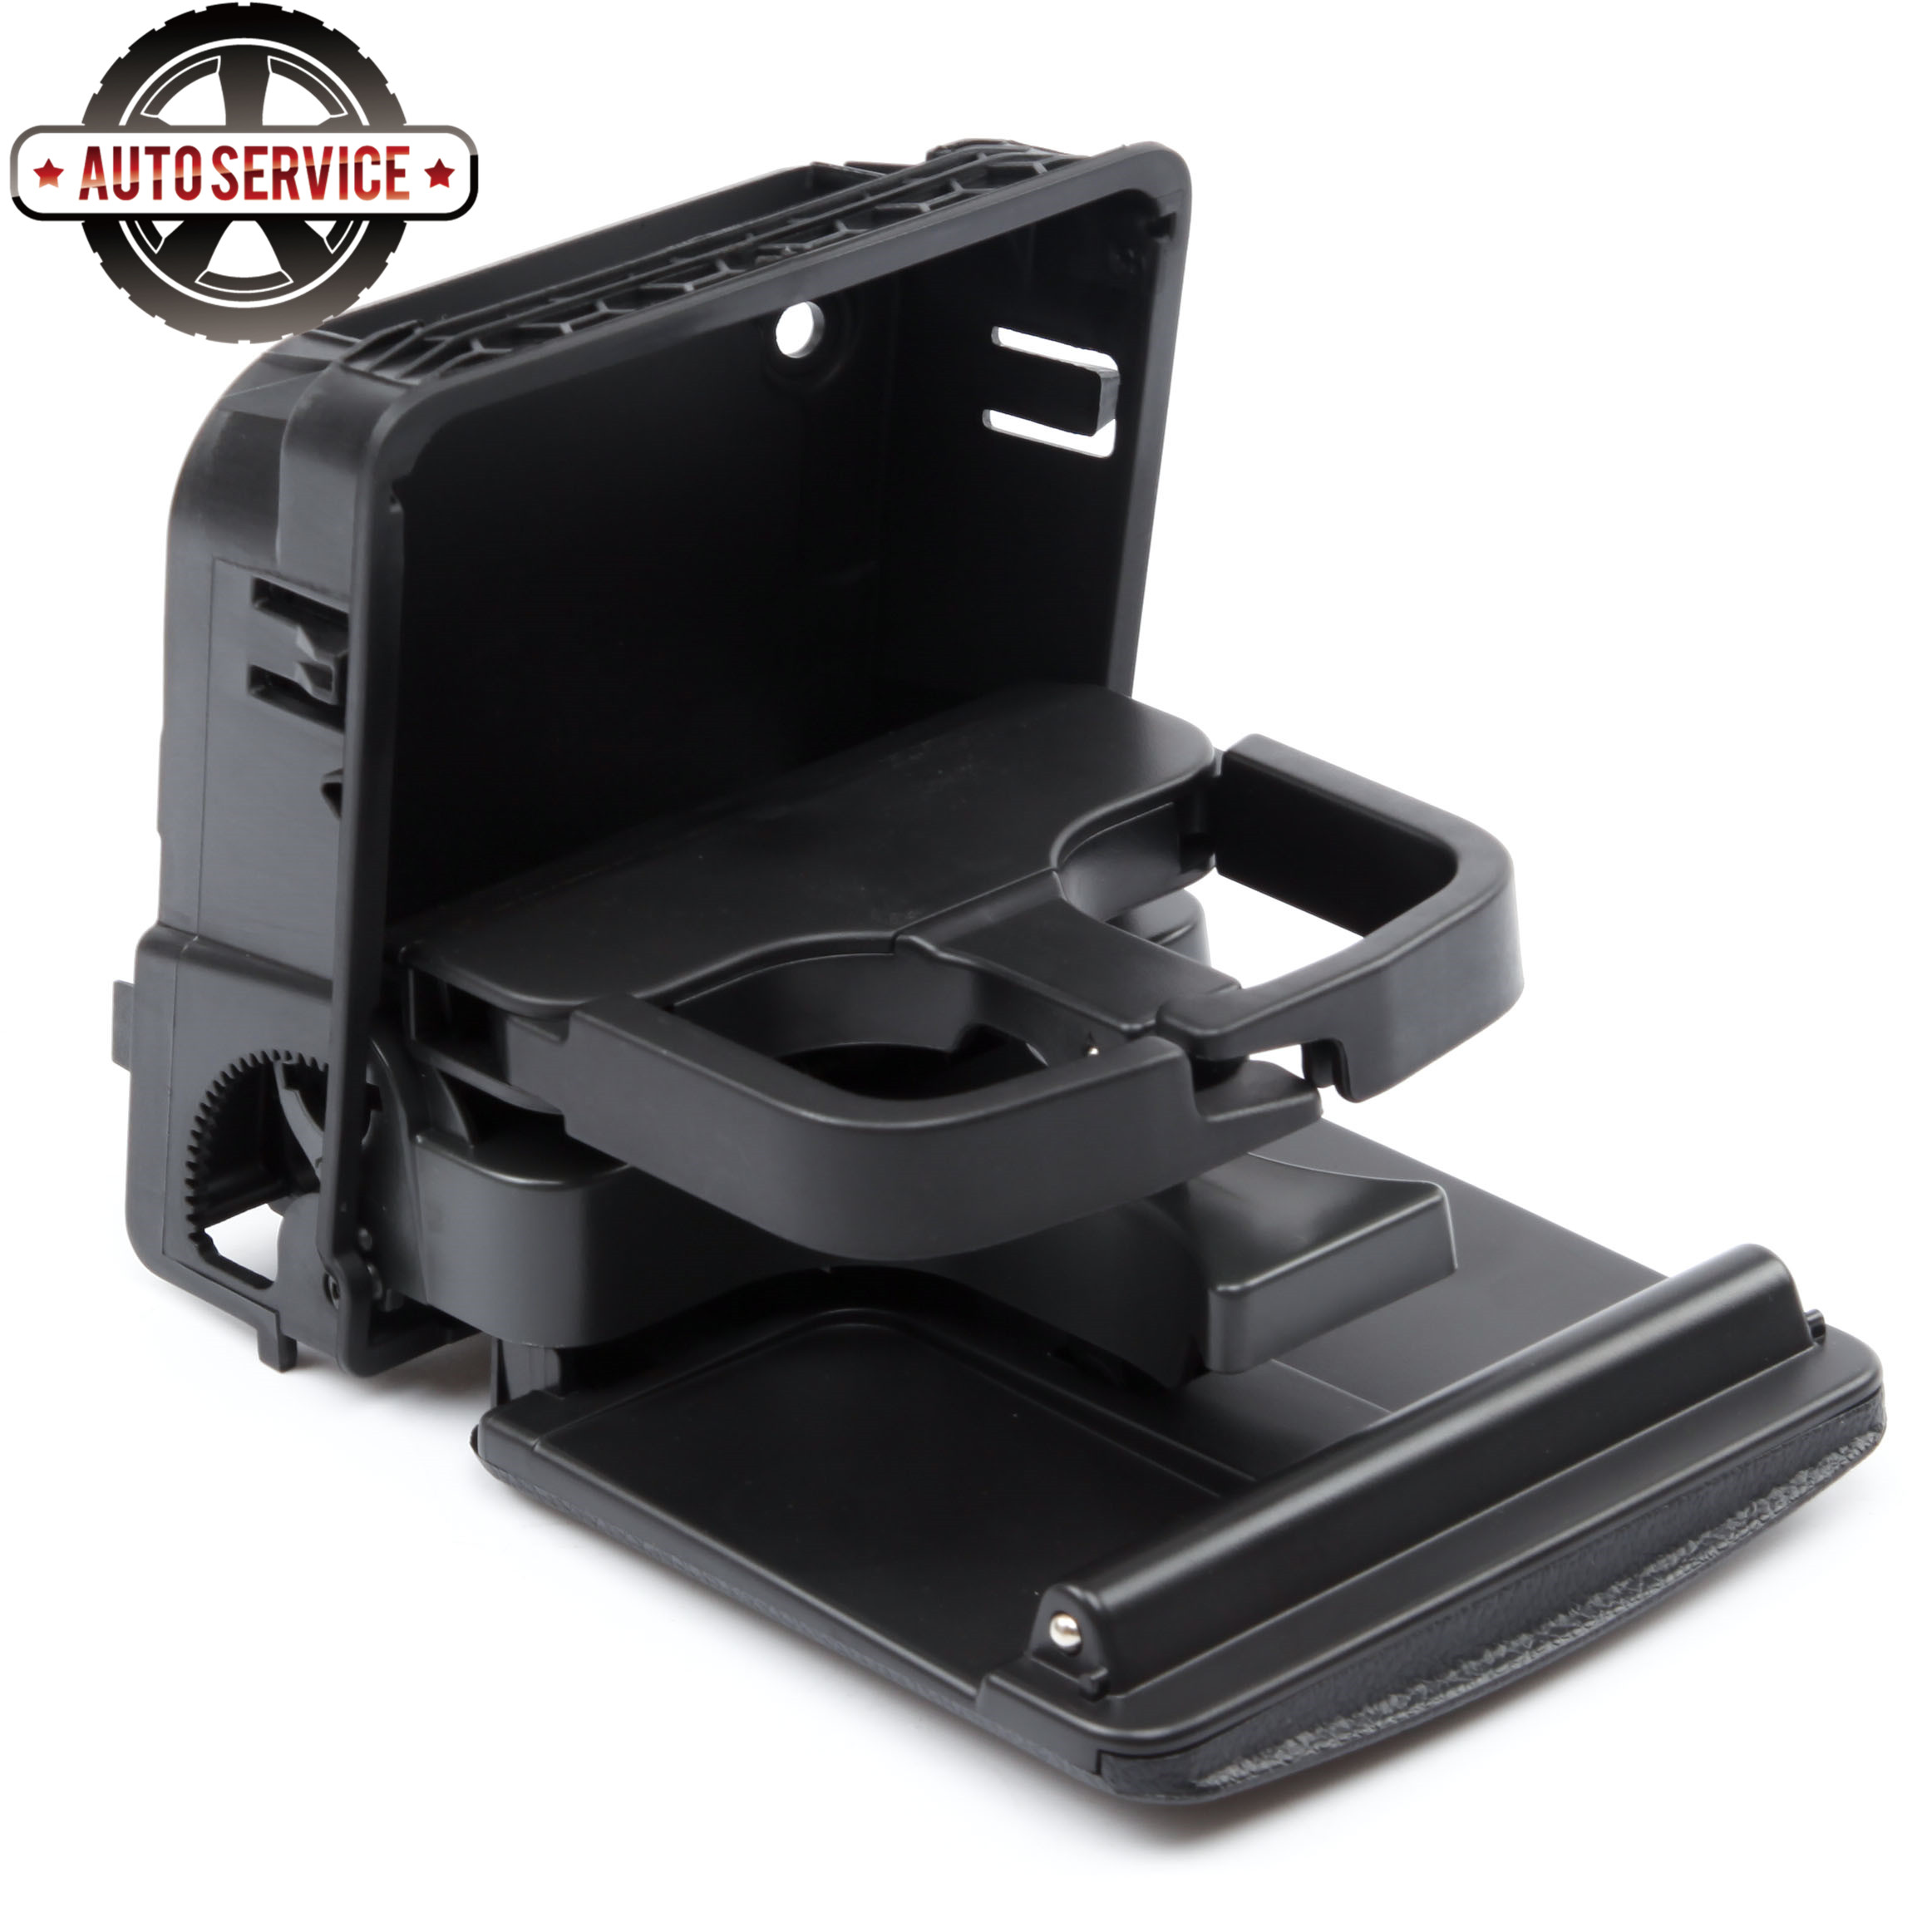 New 1K0 862 532 F Black Central Console Armrest Rear Cup Drink Holder For Jetta MK5 5 Golf MK6 EOS Rabbit 1K0862532G 1KD862533D